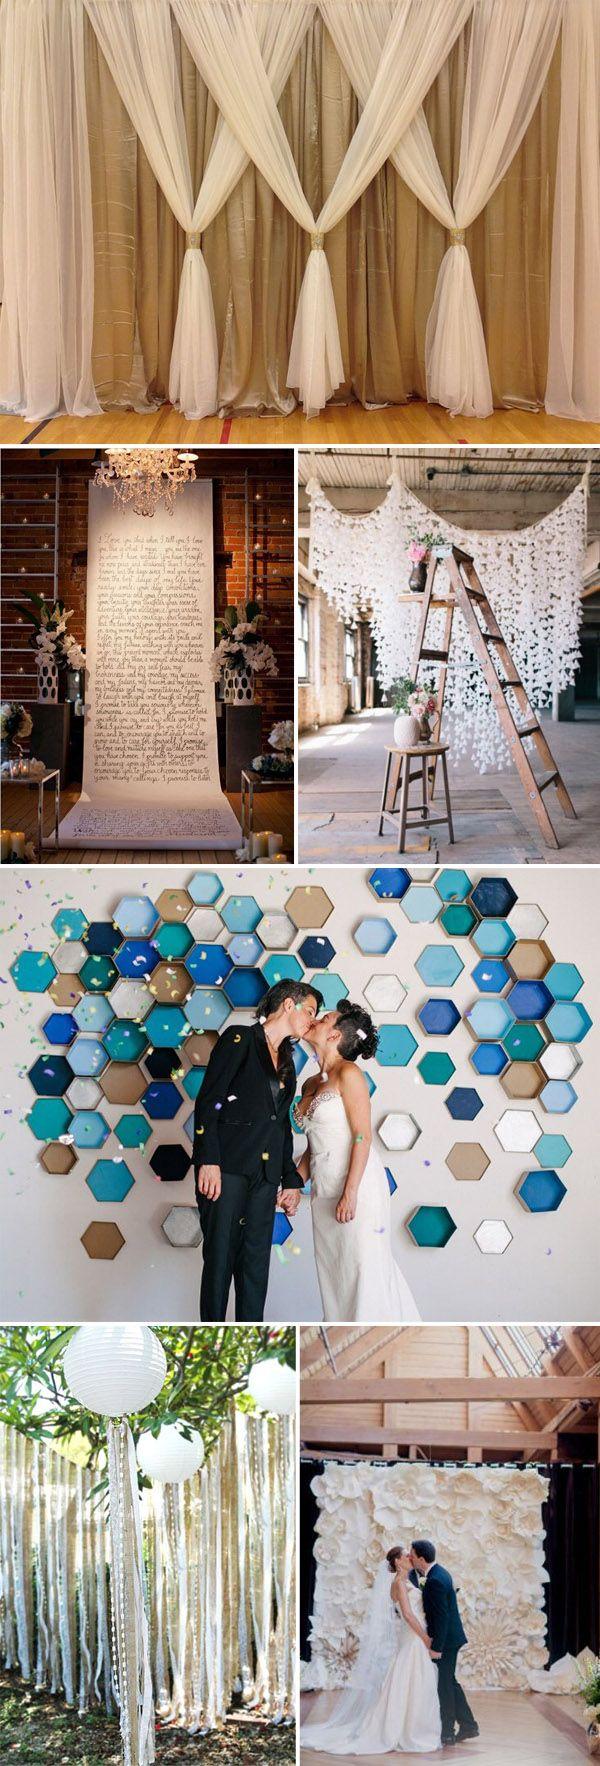 Diy wedding backdrop ideas for 2015 wedding ceremony decorationsg diy wedding backdrop ideas for 2015 wedding ceremony junglespirit Images